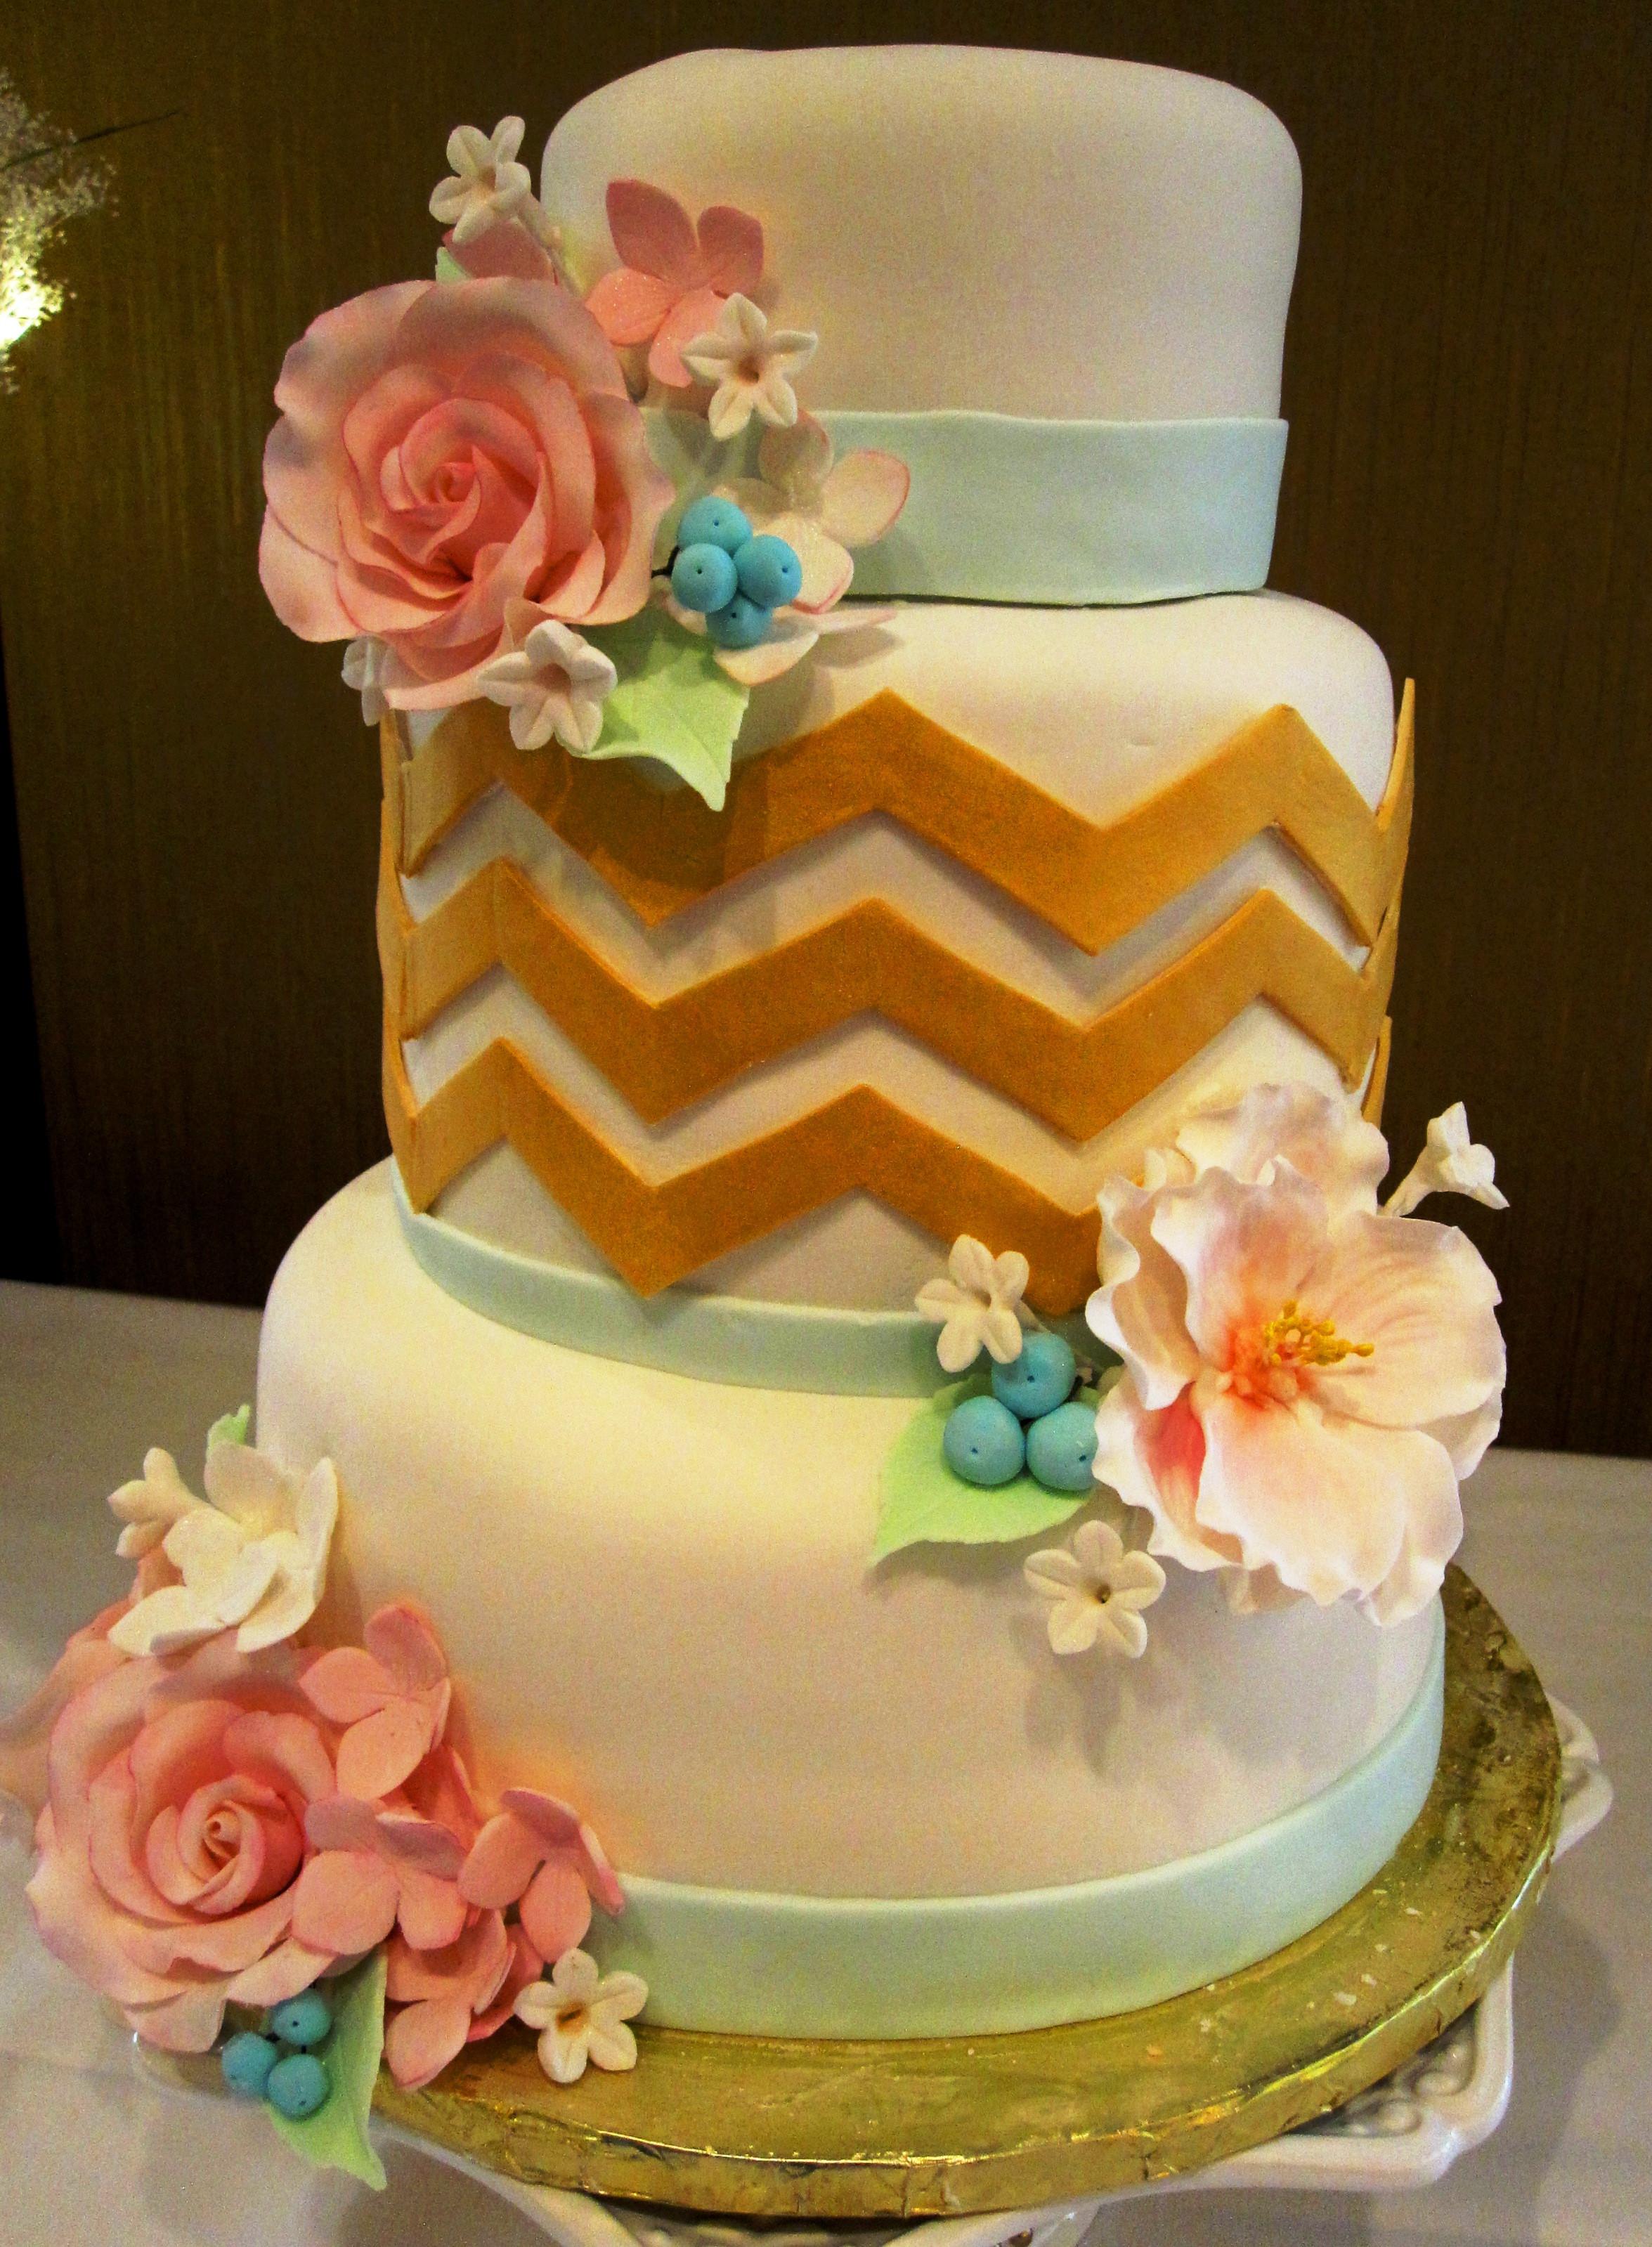 Wedding Cakes In Colorado Springs  Wedding Cake Colorado Springs Wedding Definition Ideas